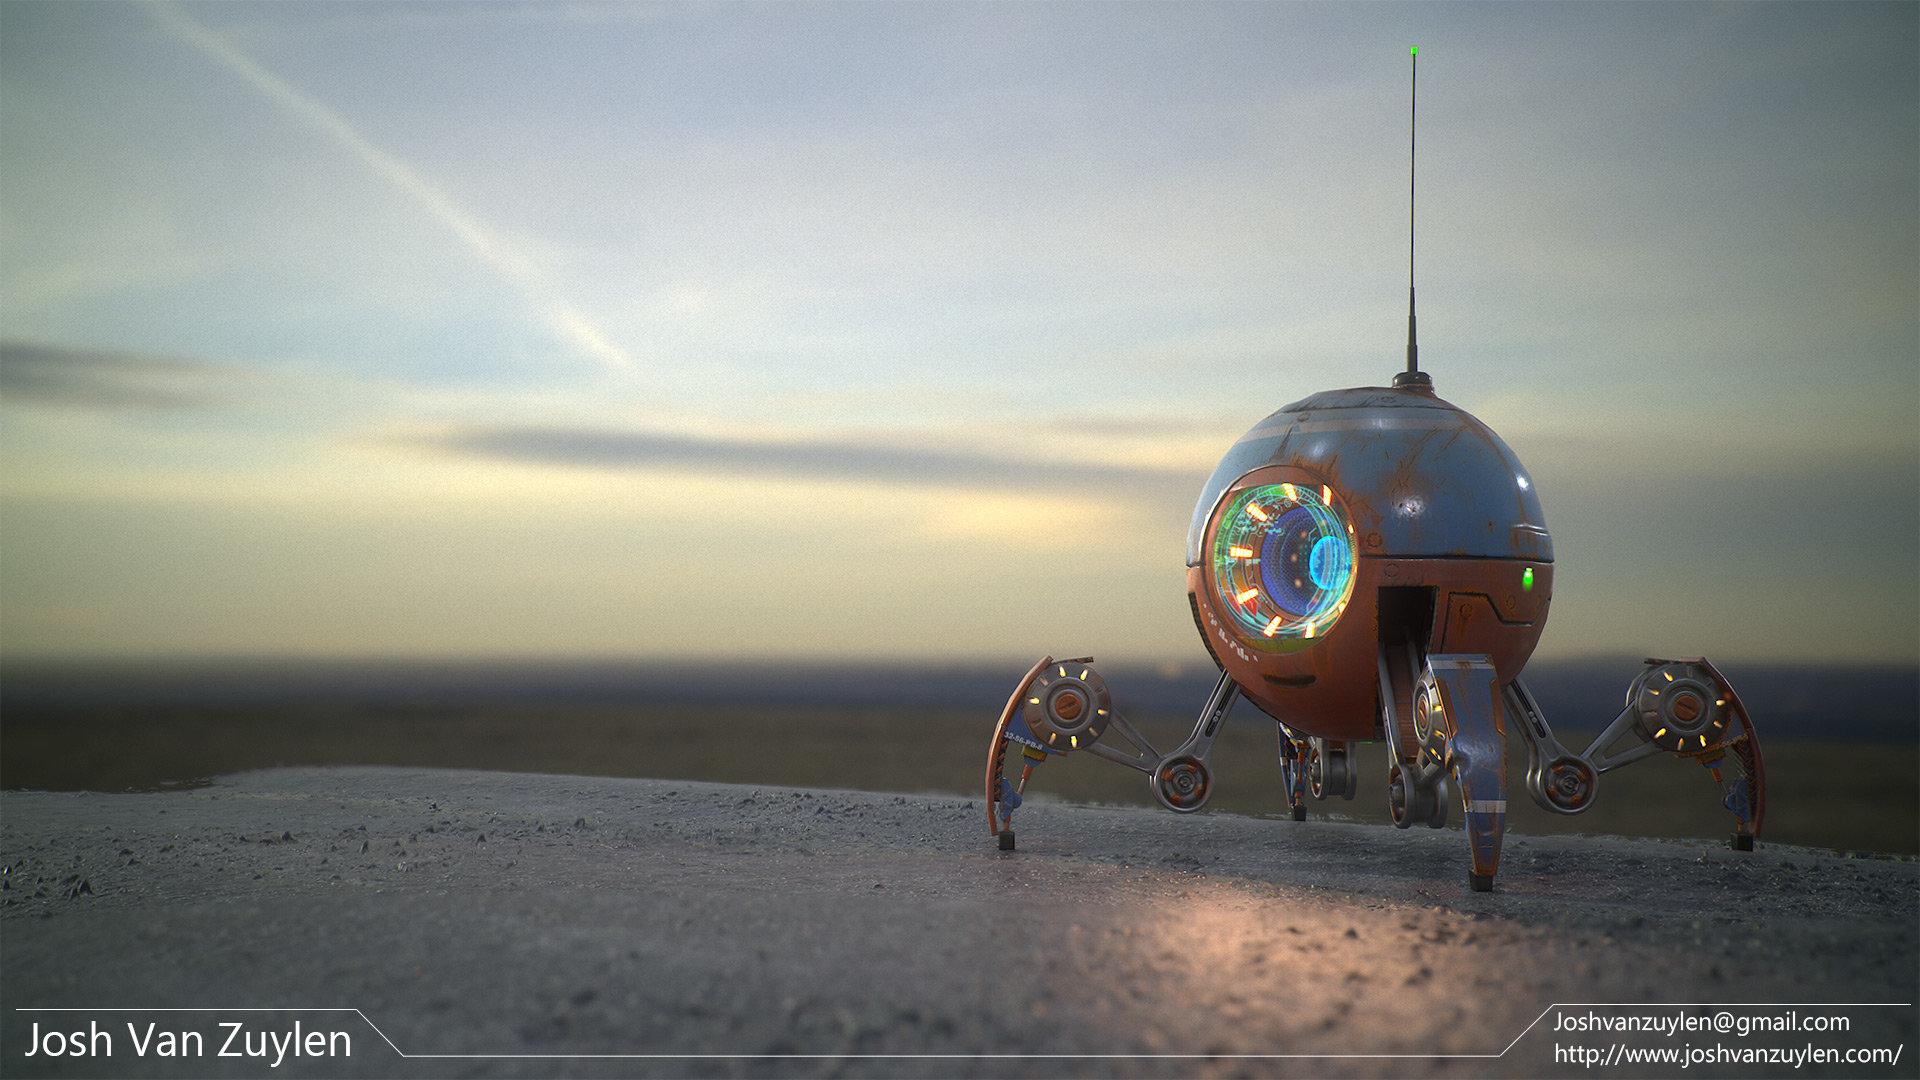 josh-van-zuylen-little-robot-final-1.jpg?1436955578